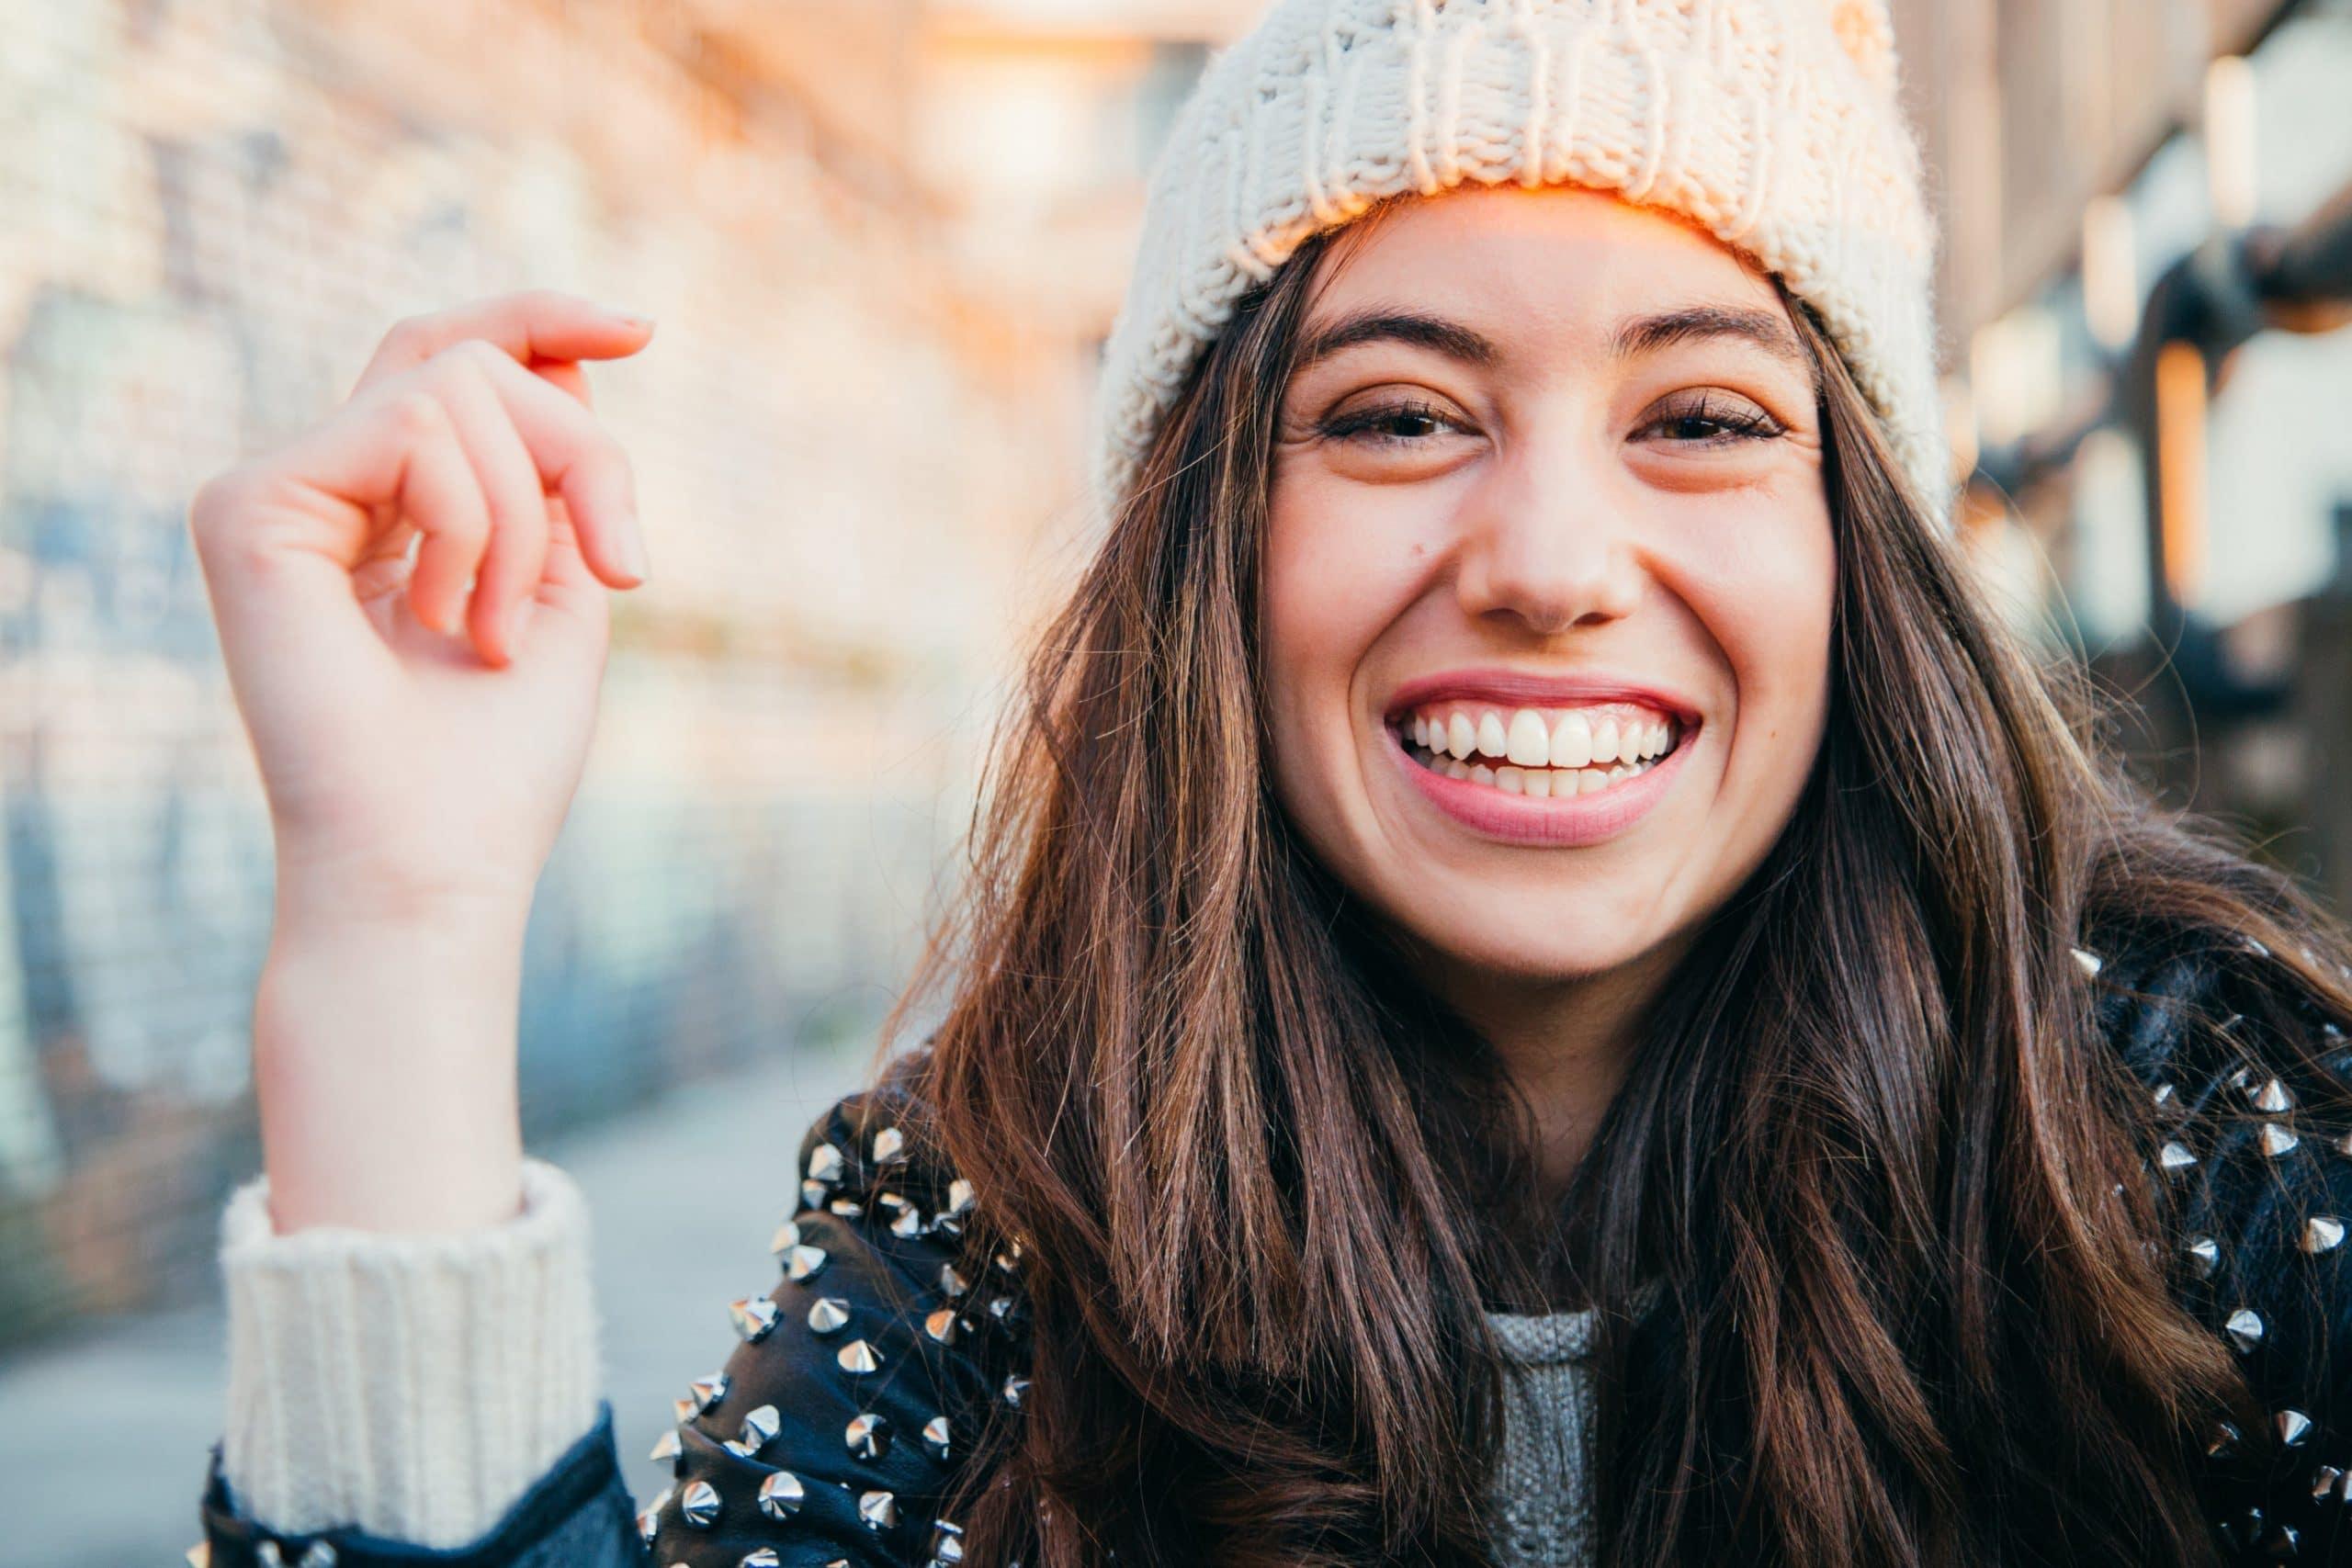 Girl smiling on camera - Advantage Medical Professionals